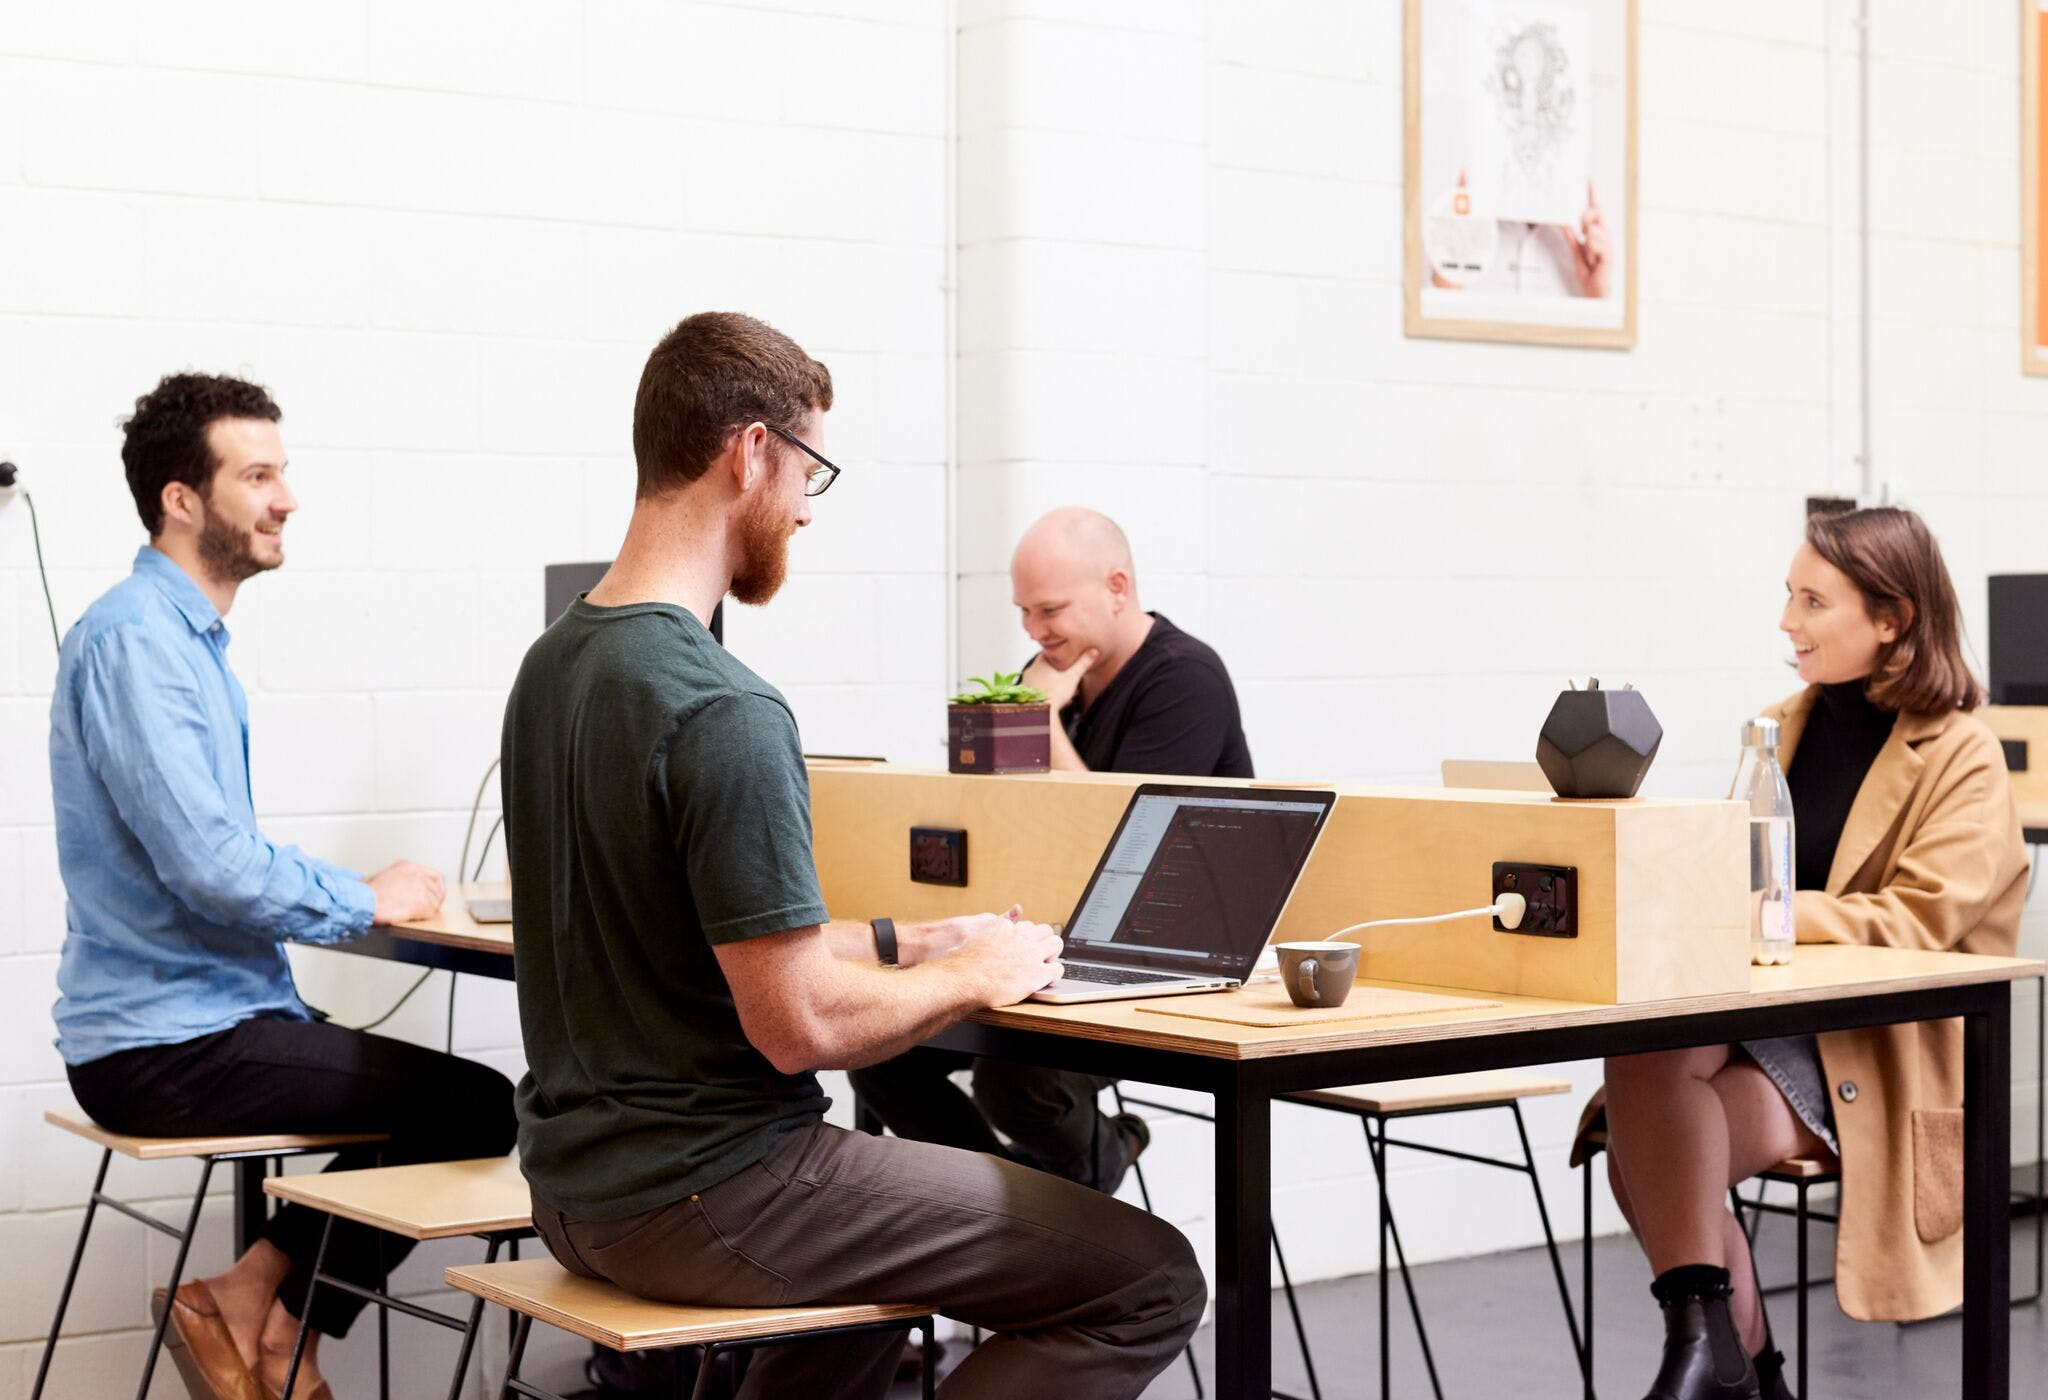 Hot desk at Entrepreneur Haus, image 1